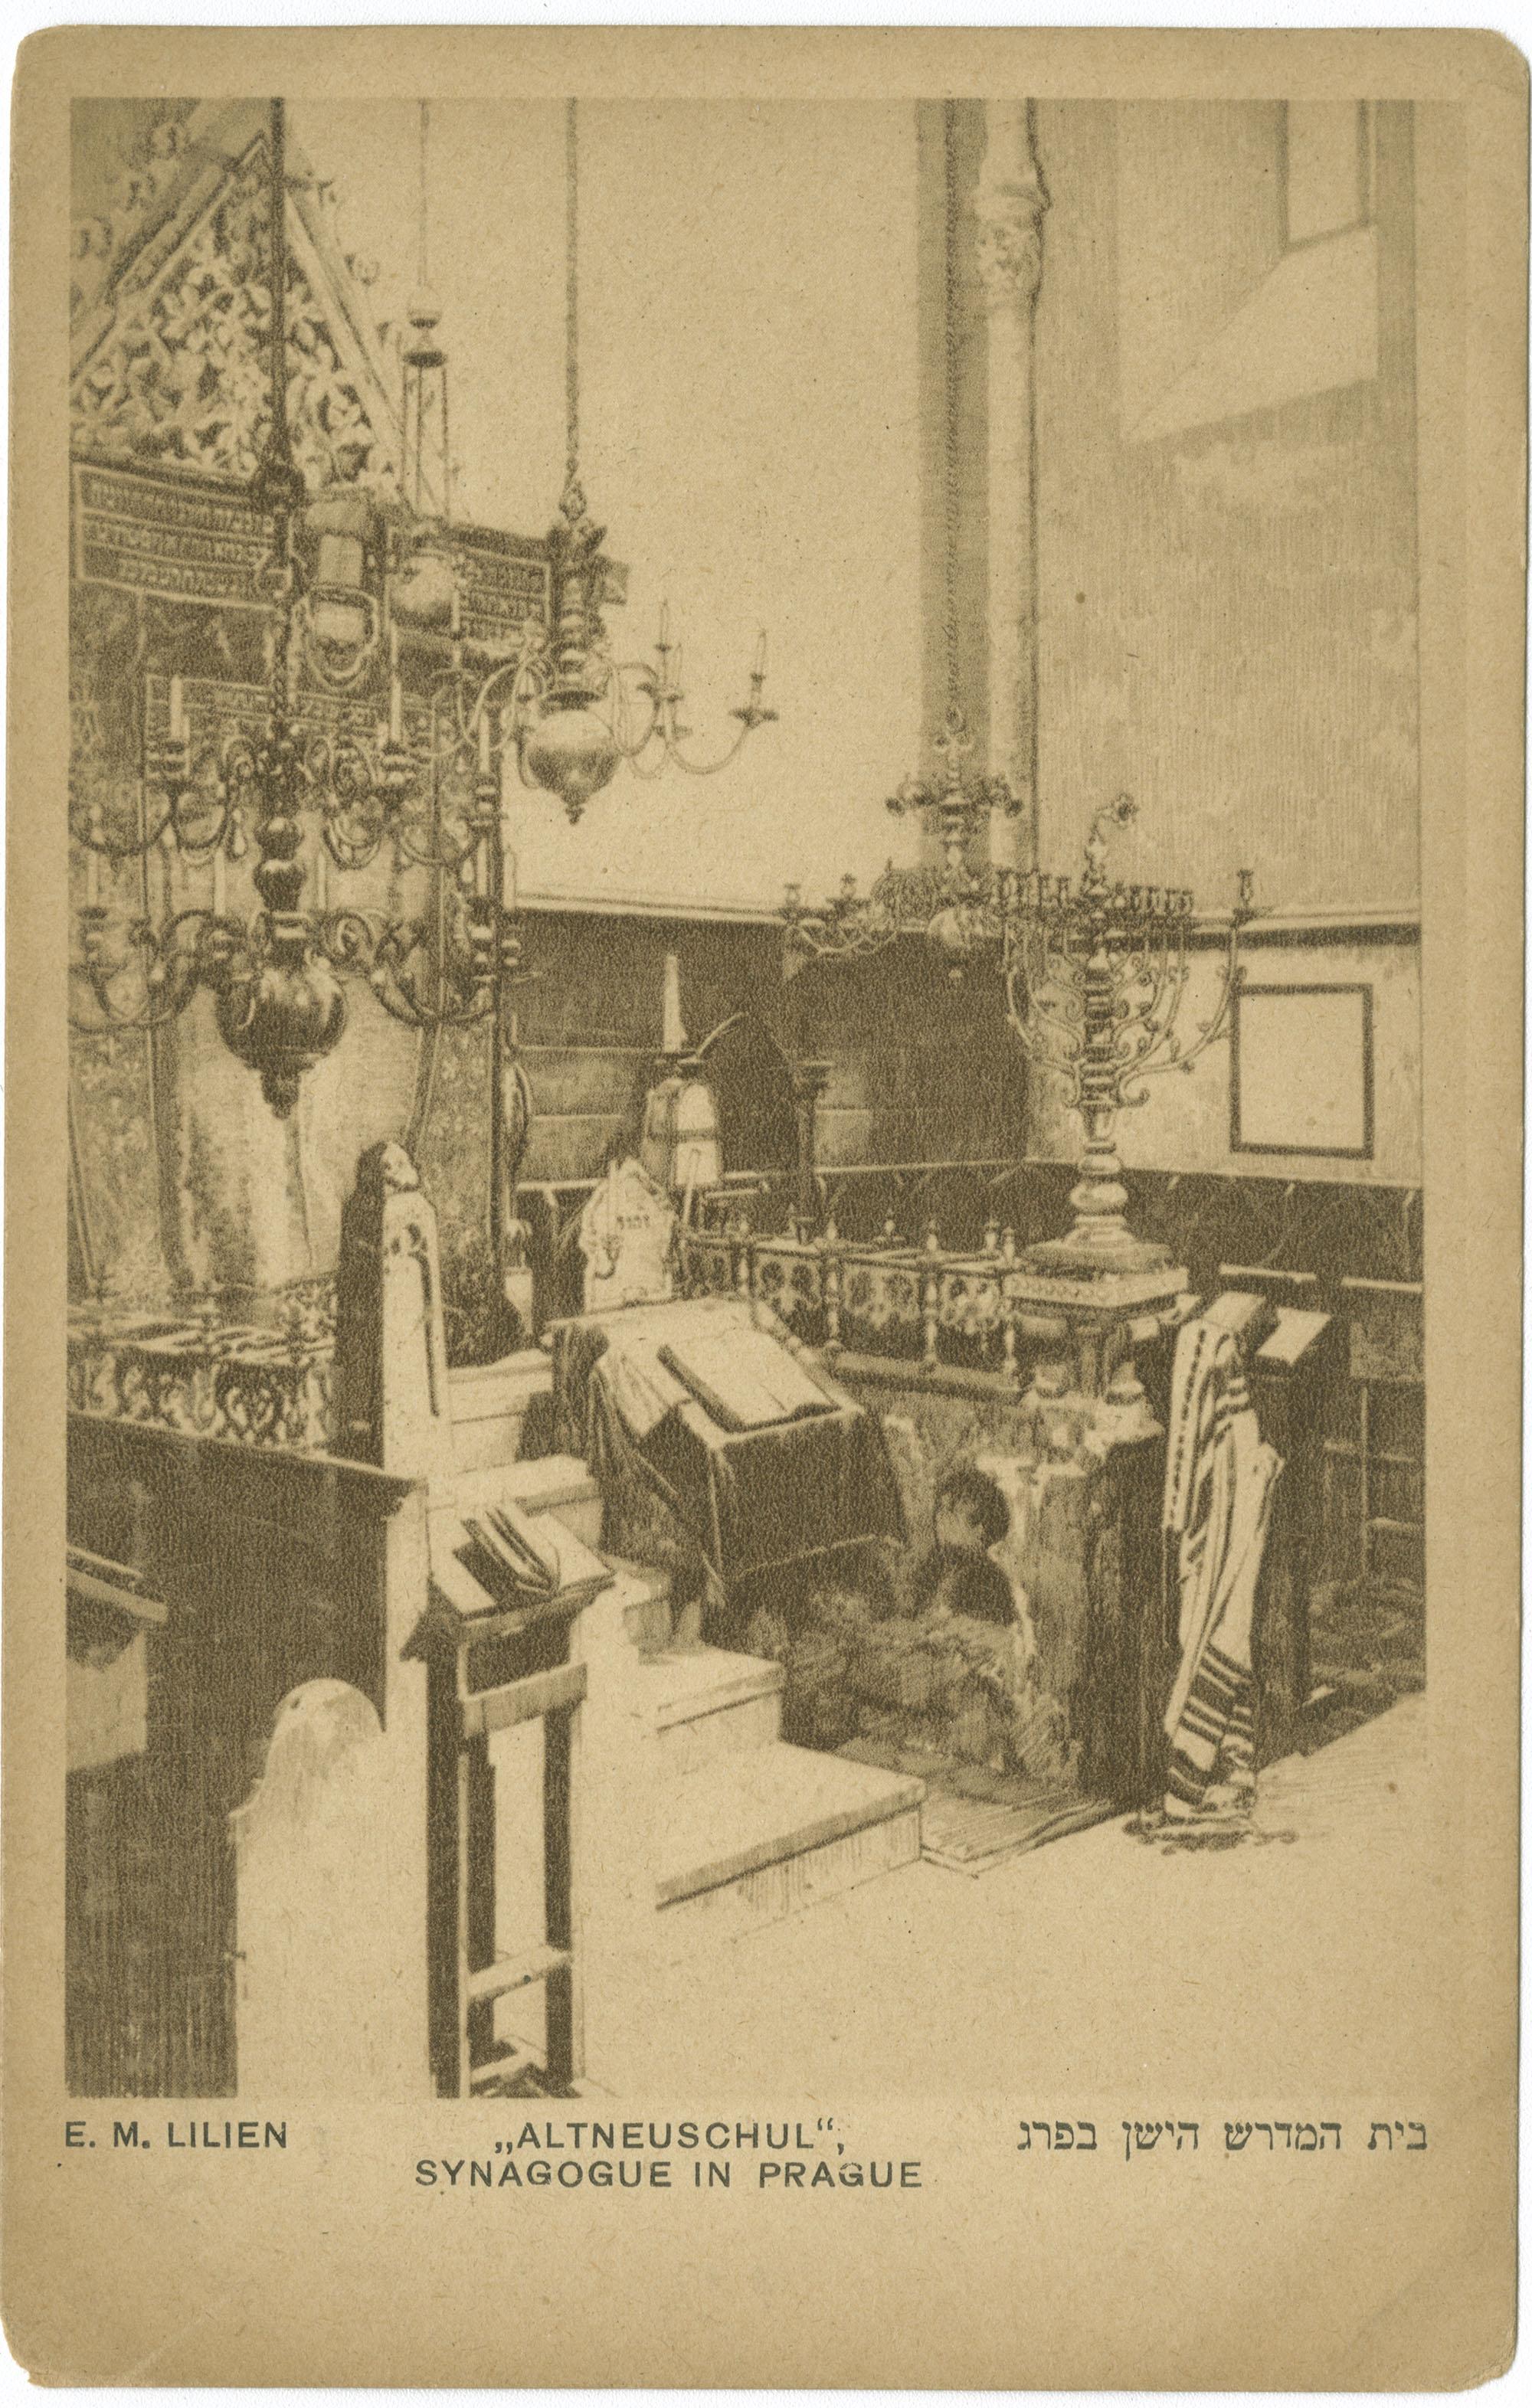 """Altneuschul"", Synagogue in Prague / בית המדרש הישן בפרג"